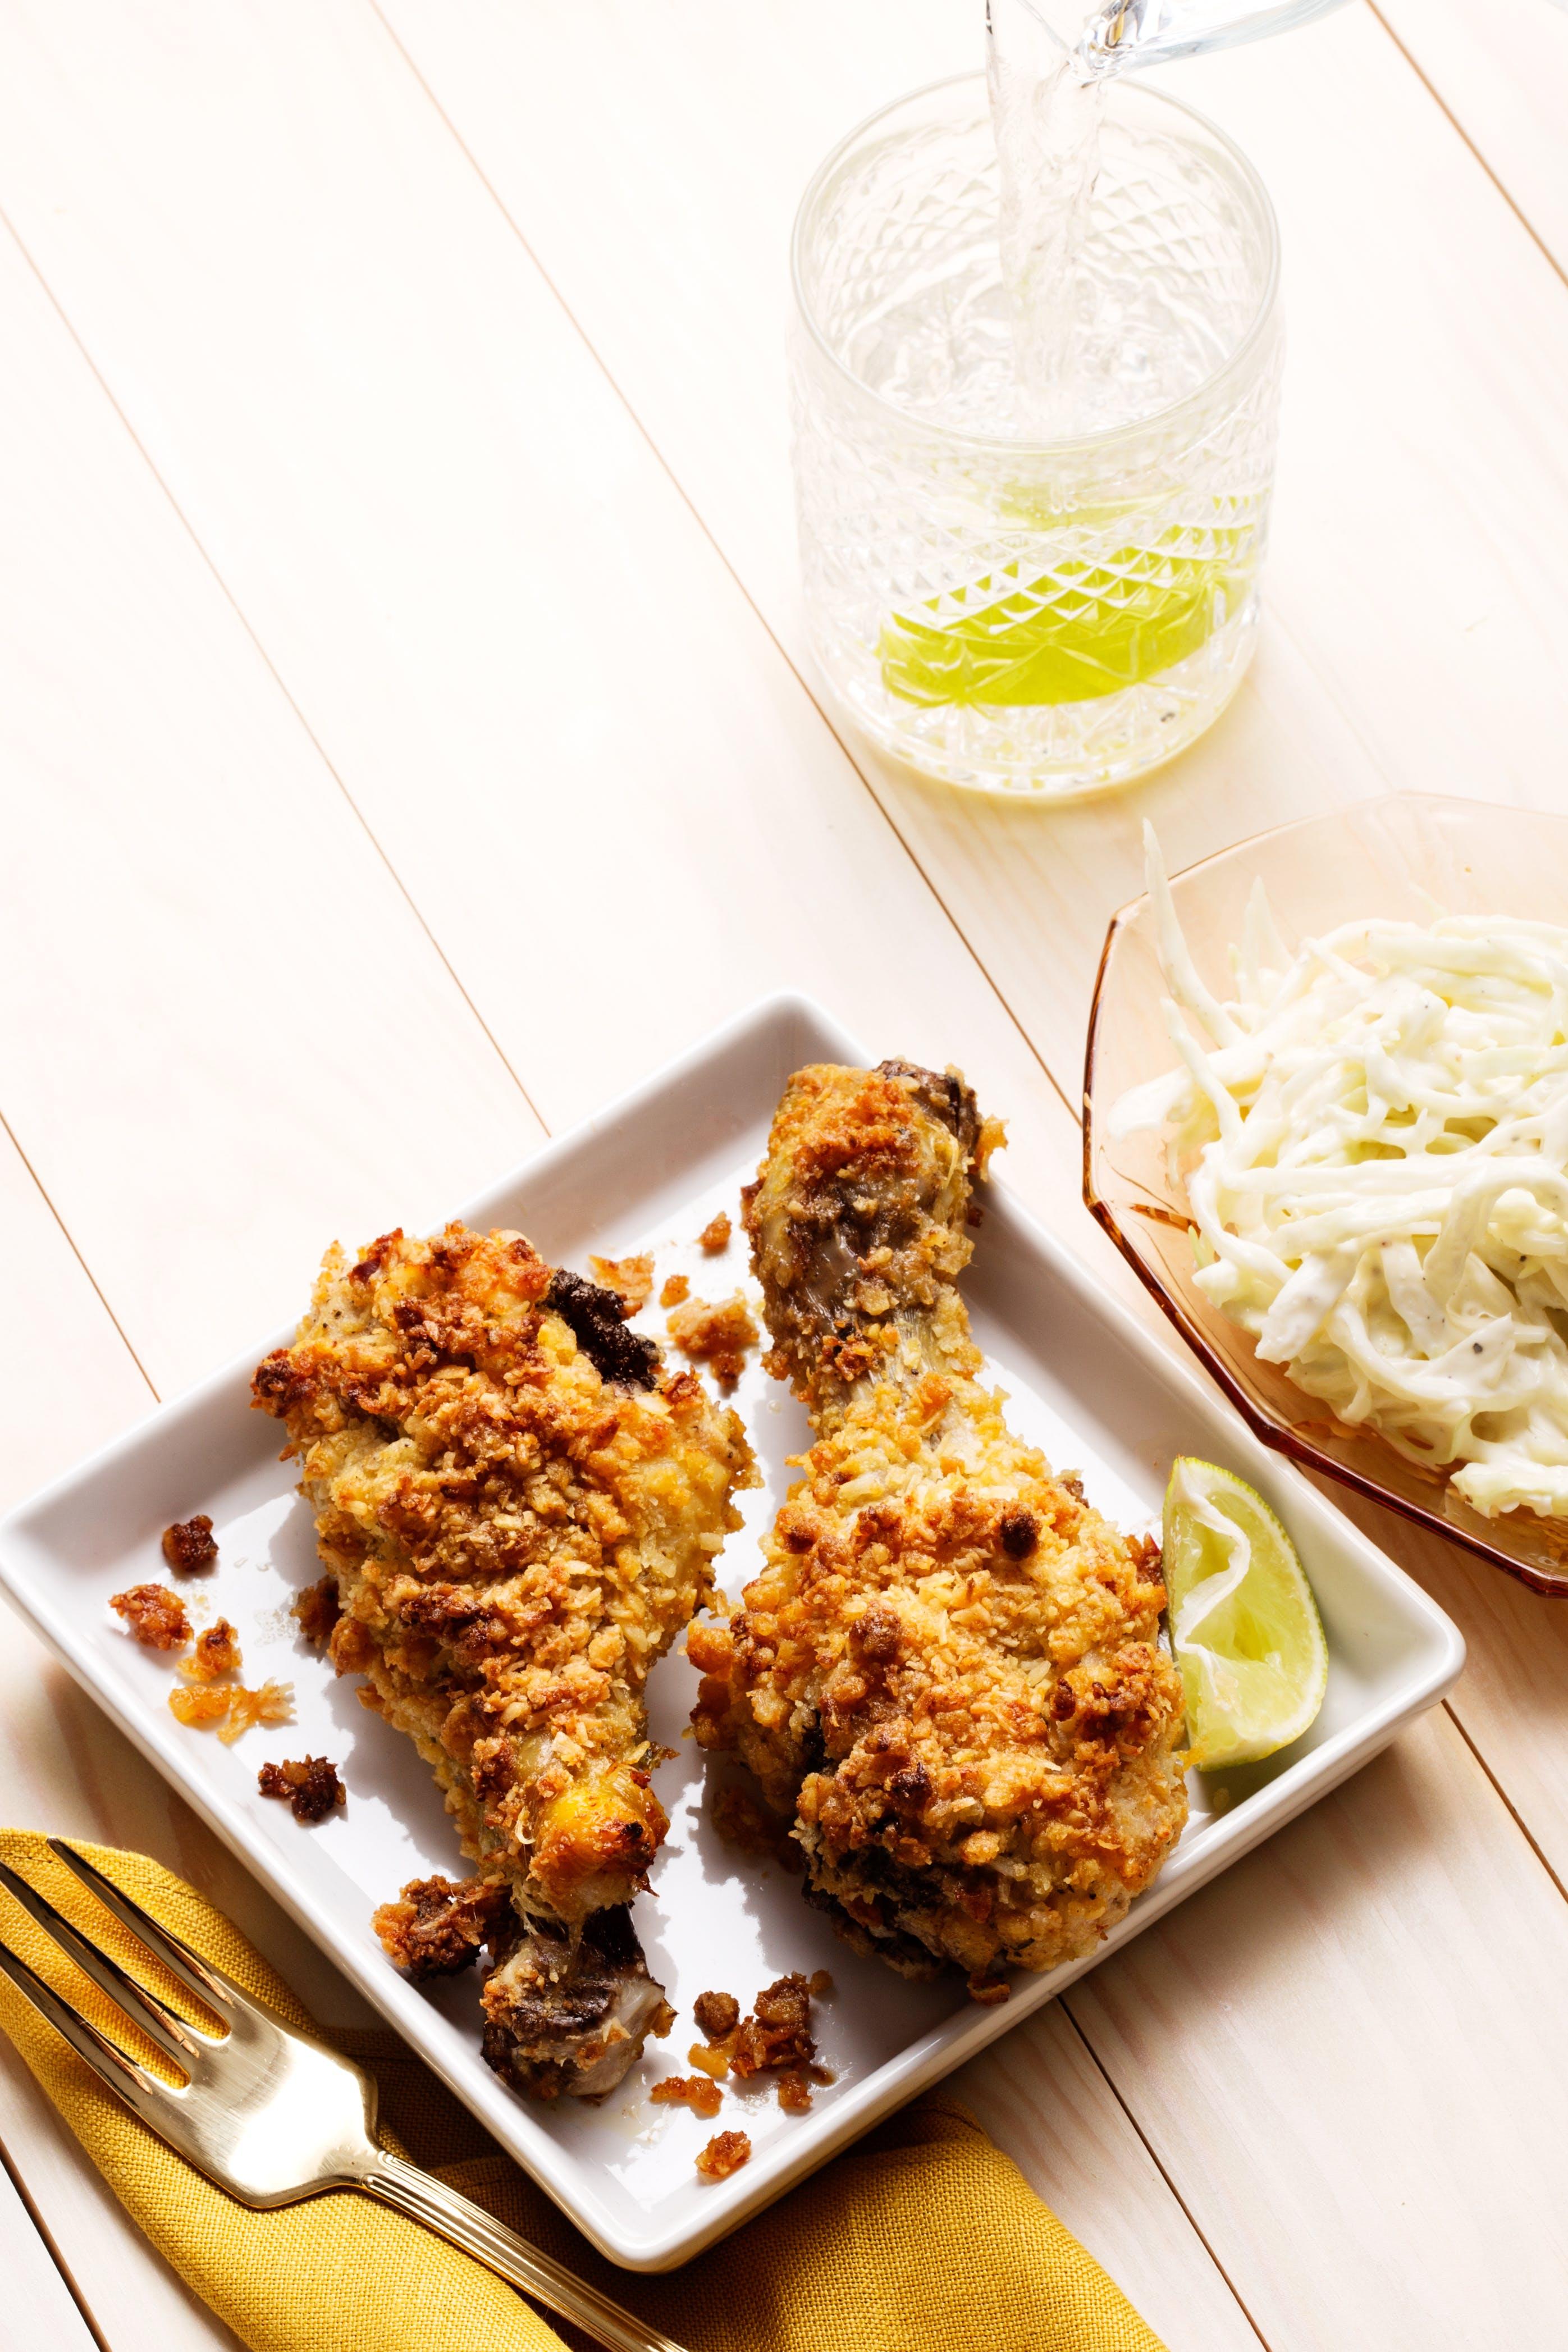 Piernas de pollo crocantes con ensalada de col